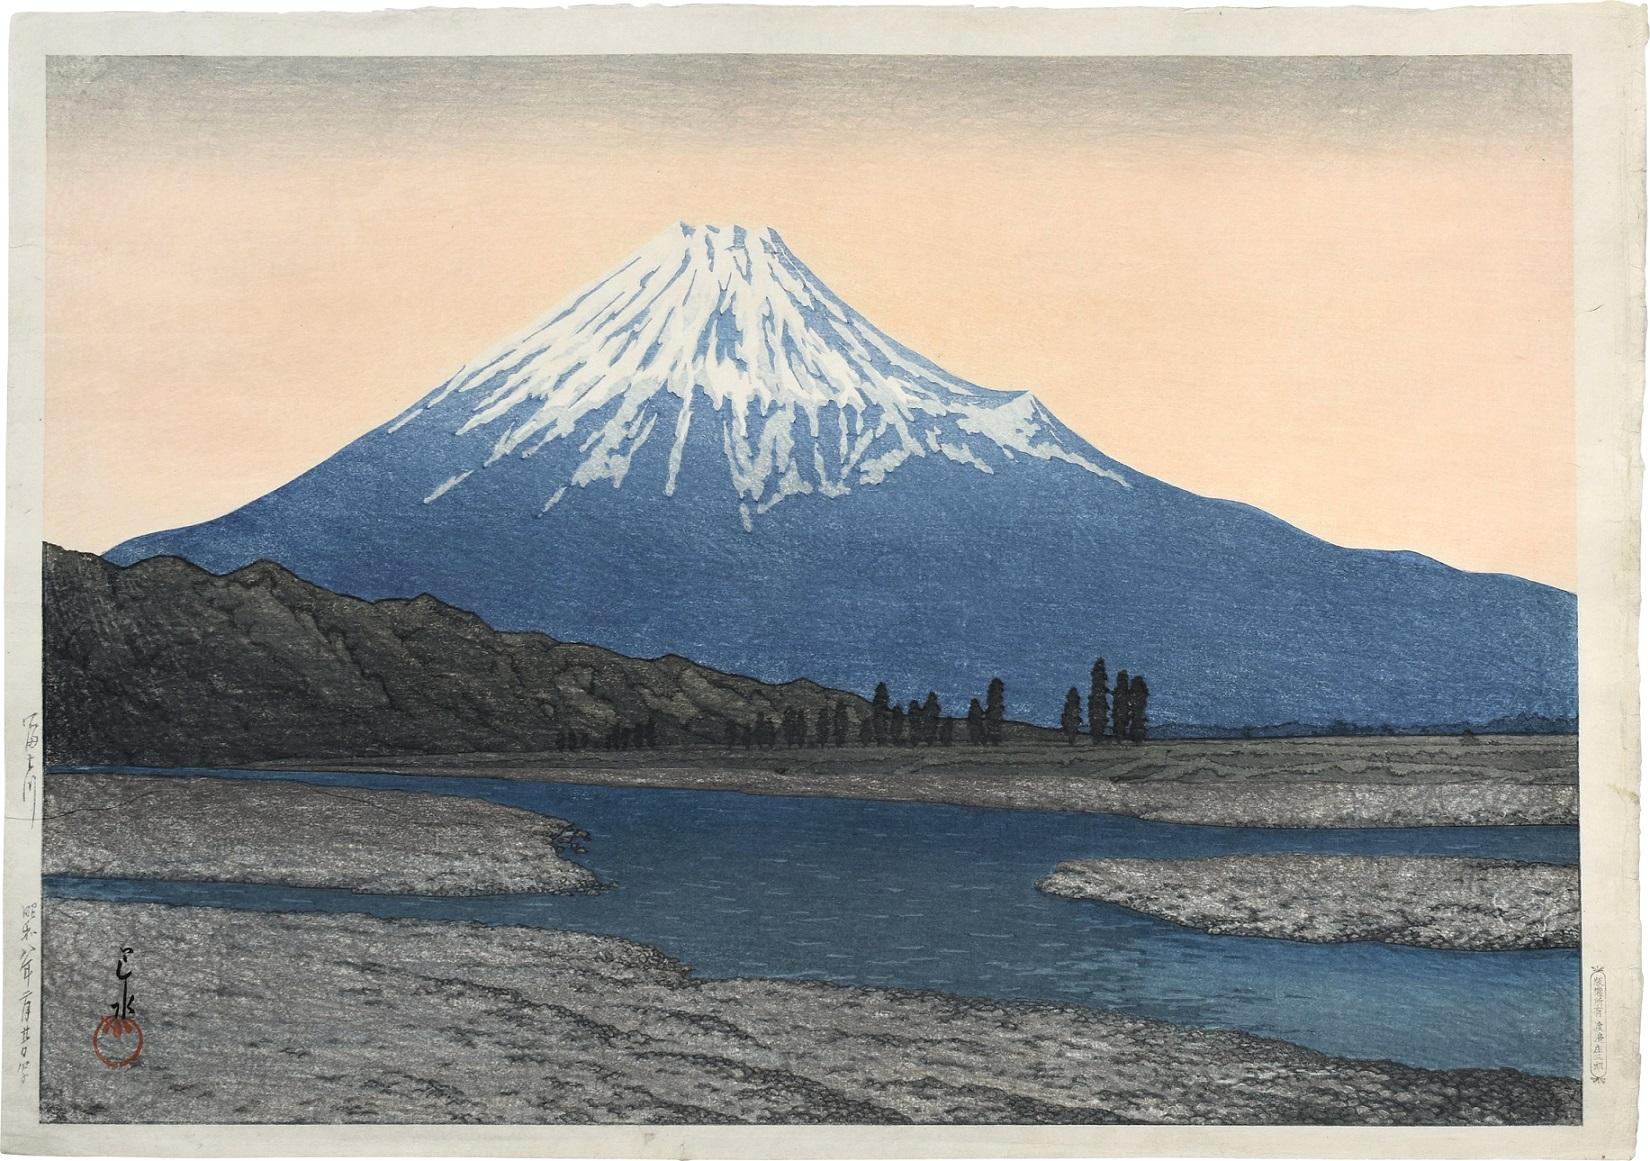 Fuji River by Kawase Hasui